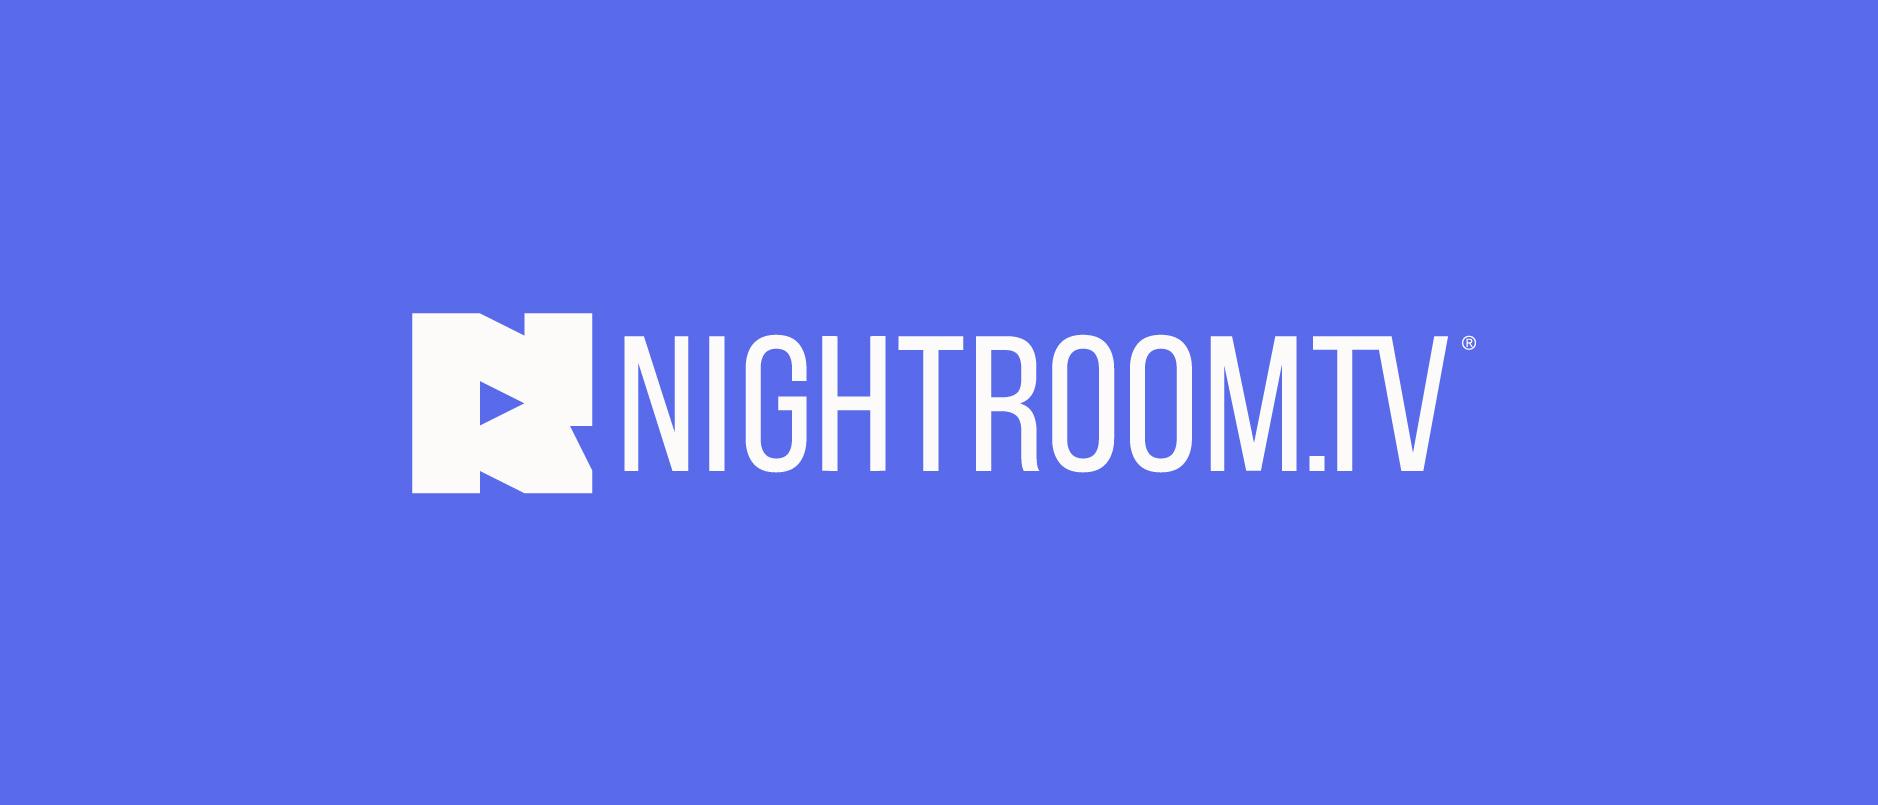 Diseño de Logotipo Night Room TV - tabarestabares